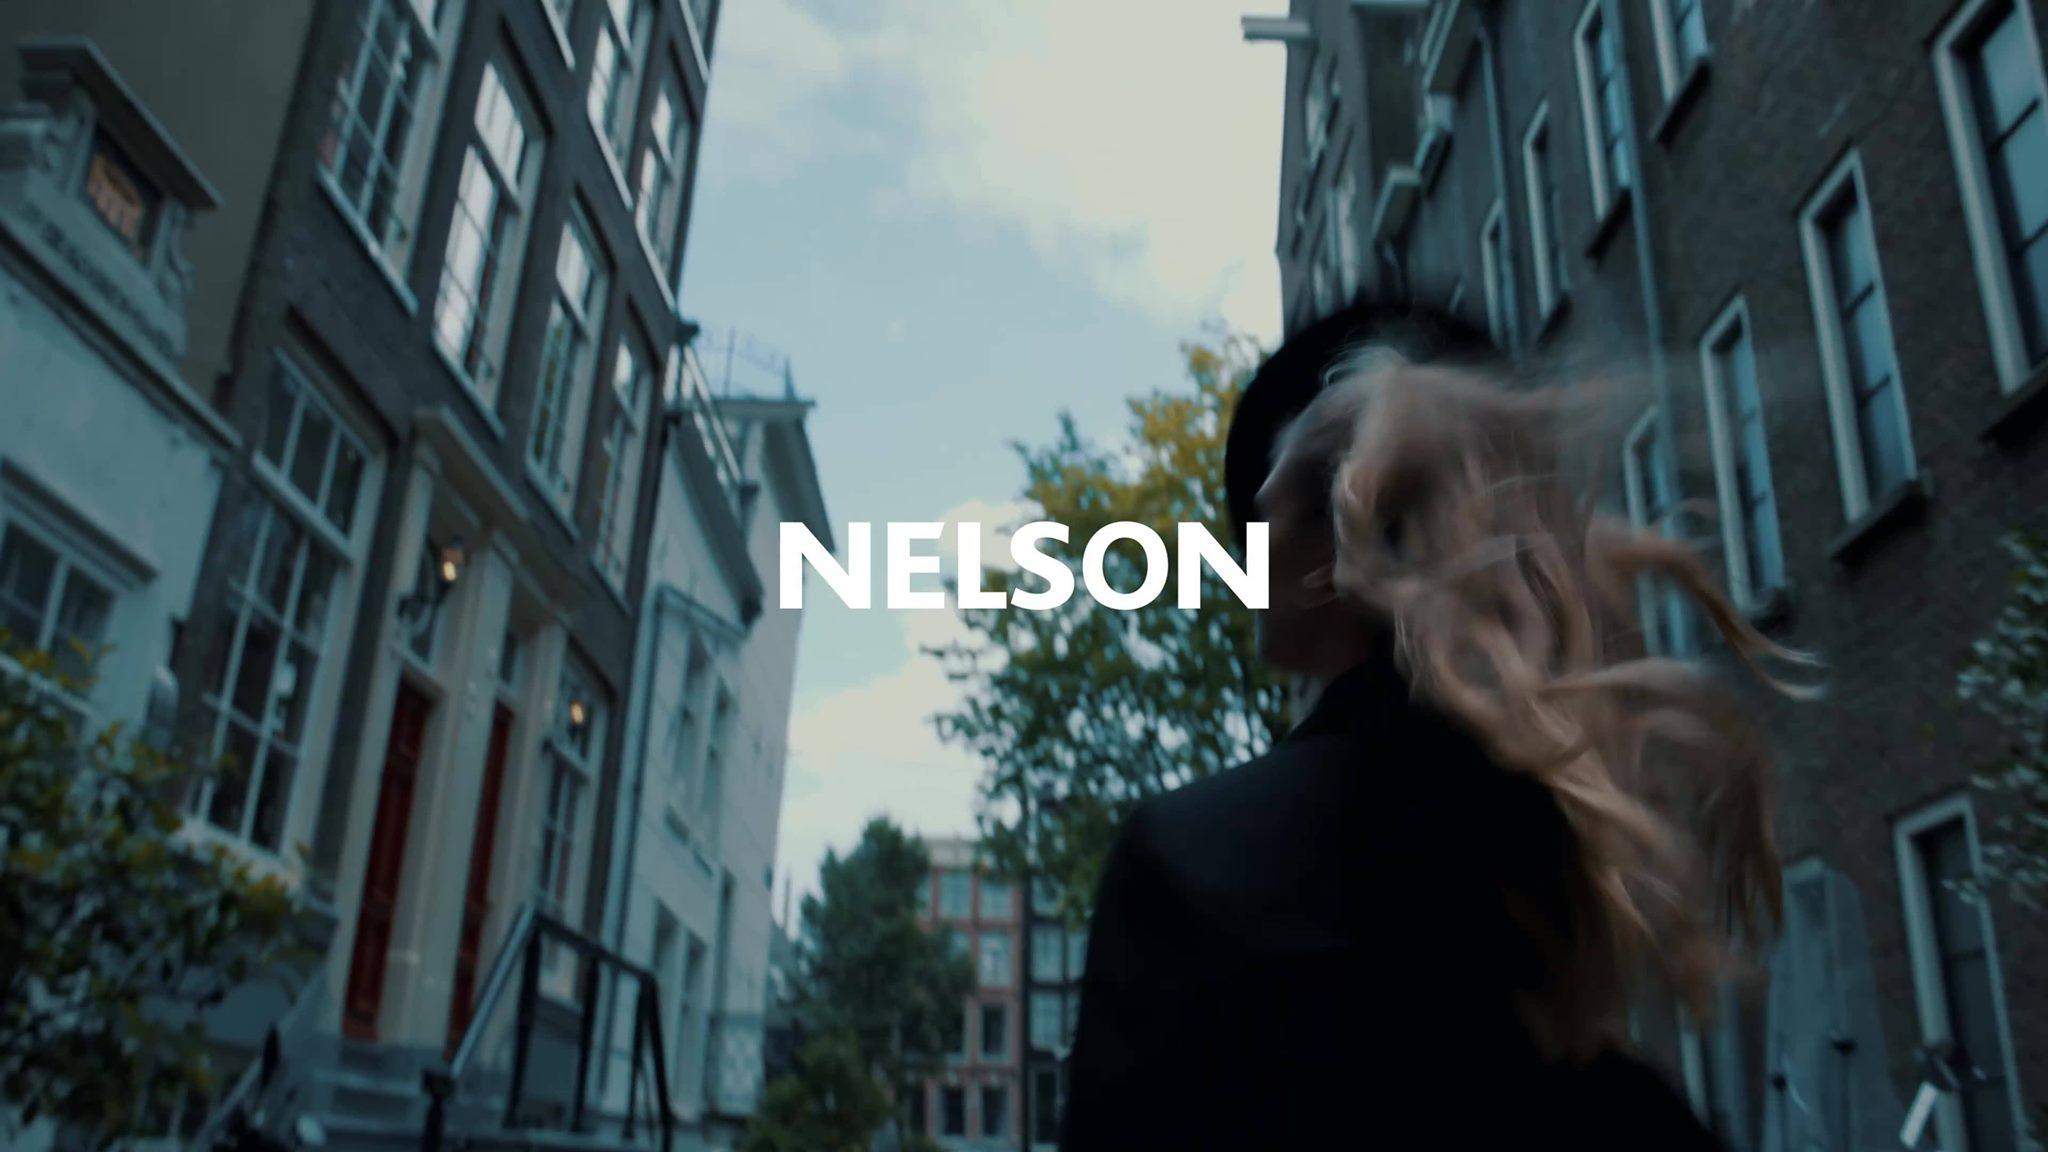 nelson-gallery